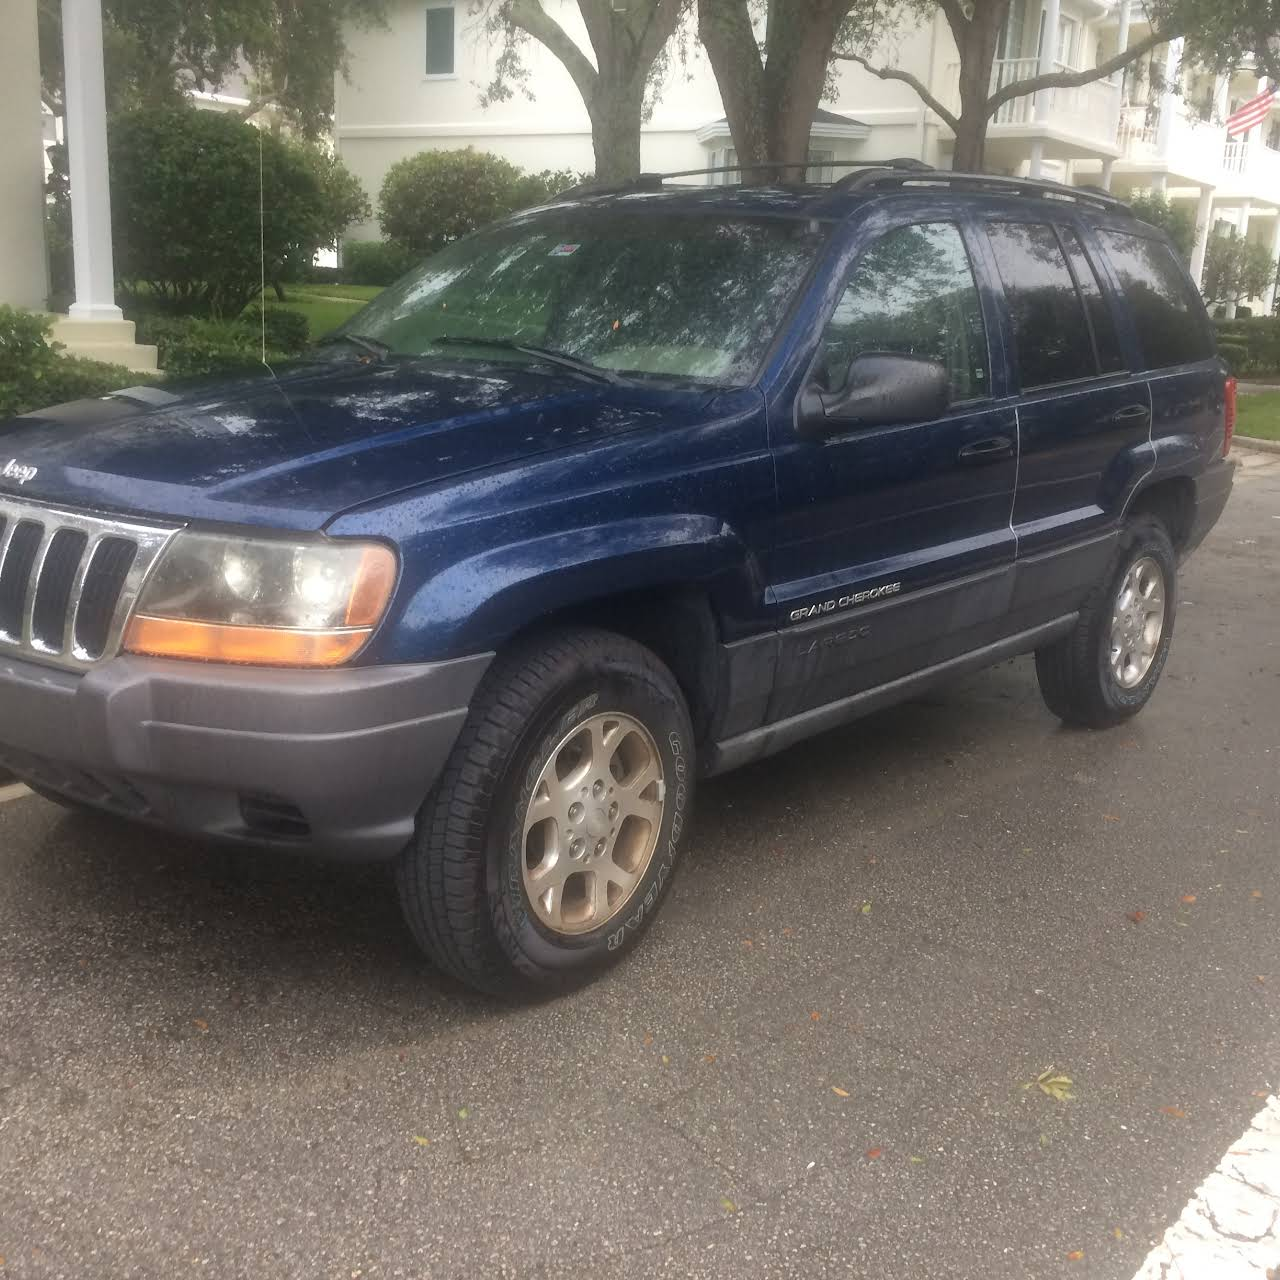 Car Buyers Junk Car Buyers - Auto Buyers Palm Beach